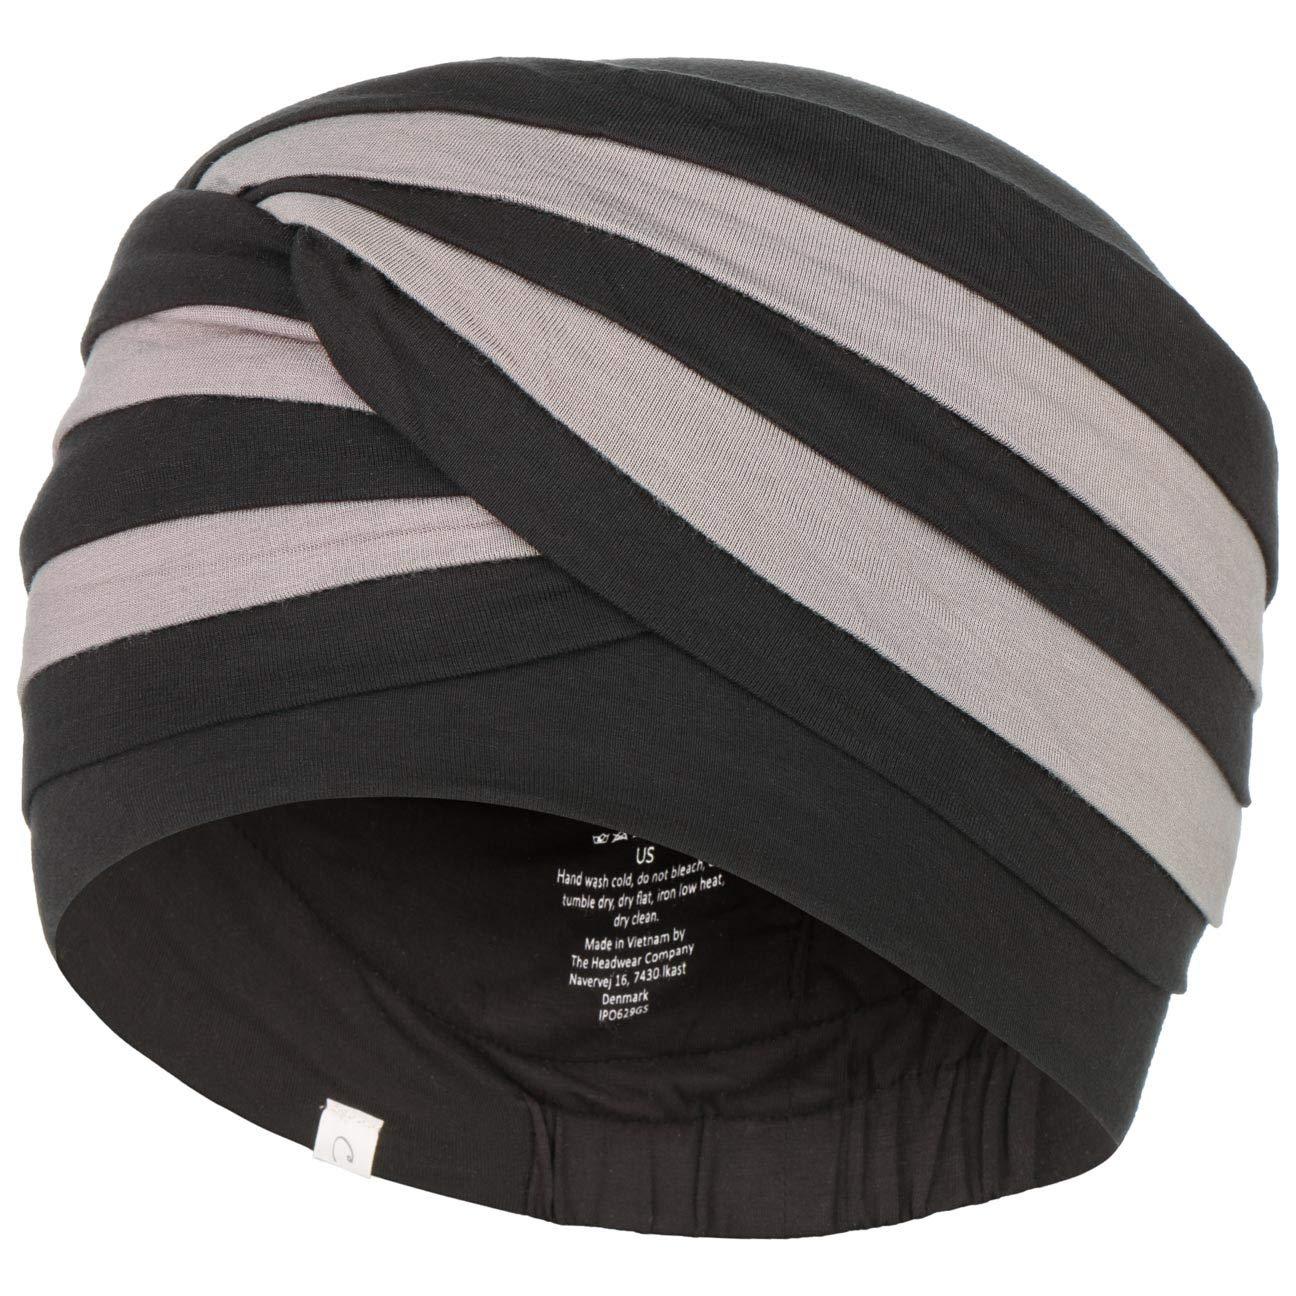 5c4dddfdbeb Chemo turban in bamboo viscose - Shanti black and brown  Amazon.co.uk   Clothing